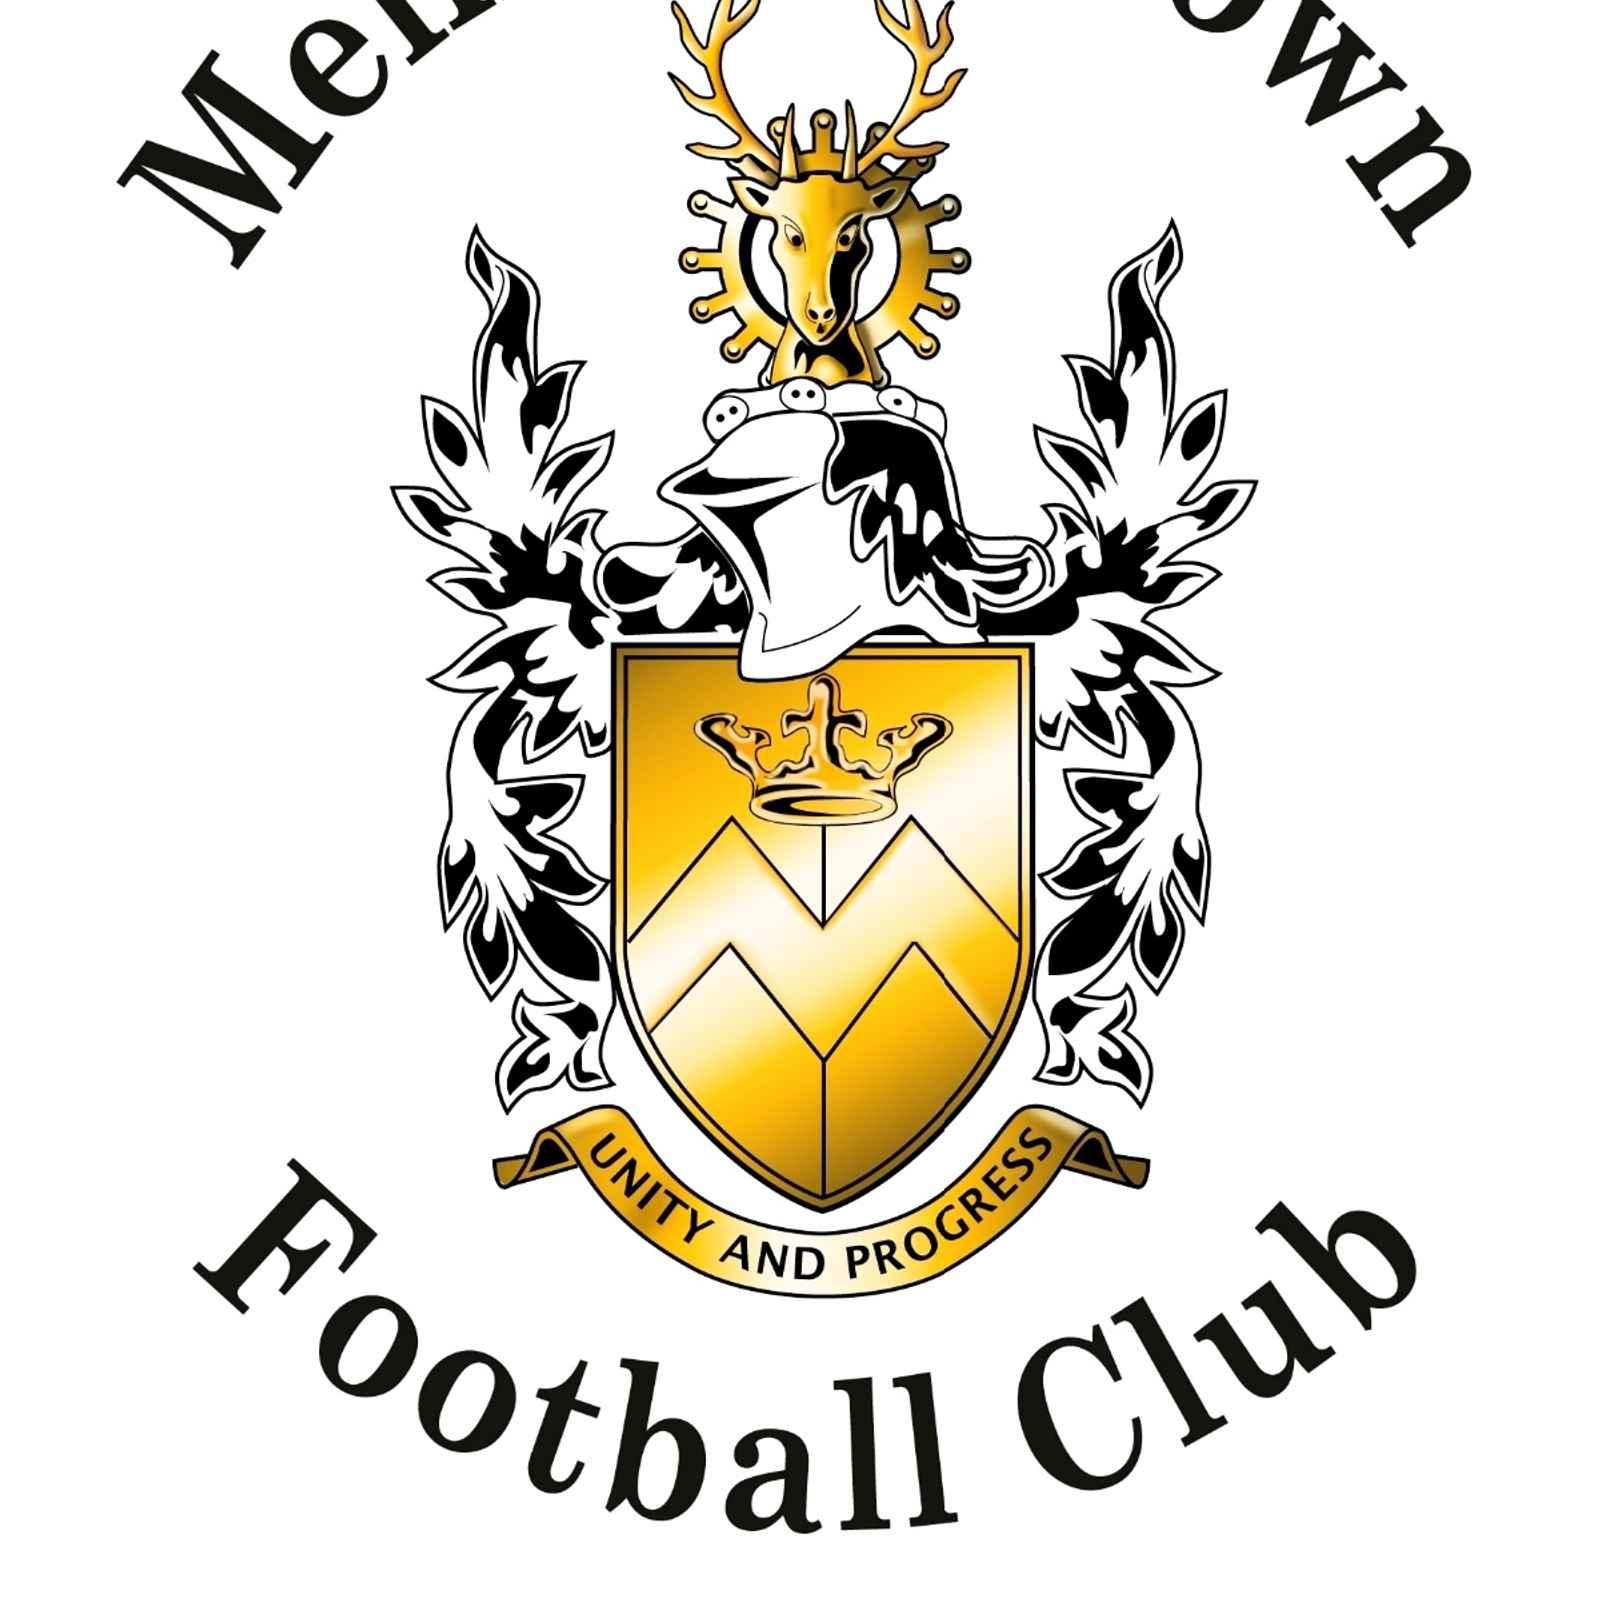 New MTFC Membership Scheme Coming Soon